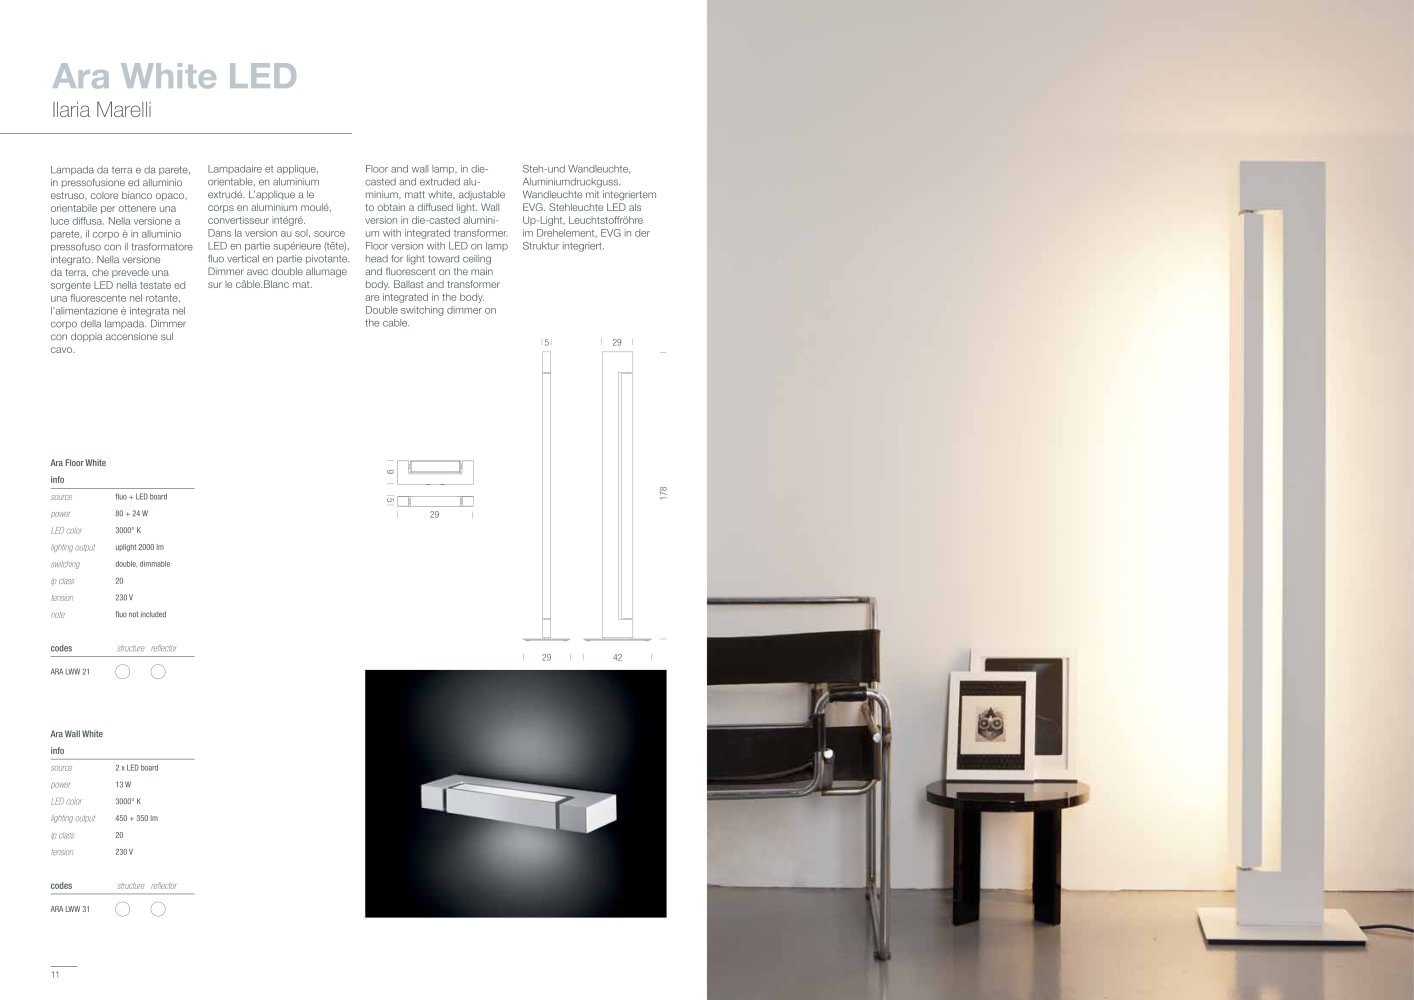 Ara White LED - NEMO - PDF Catalogues | Documentation | Brochures